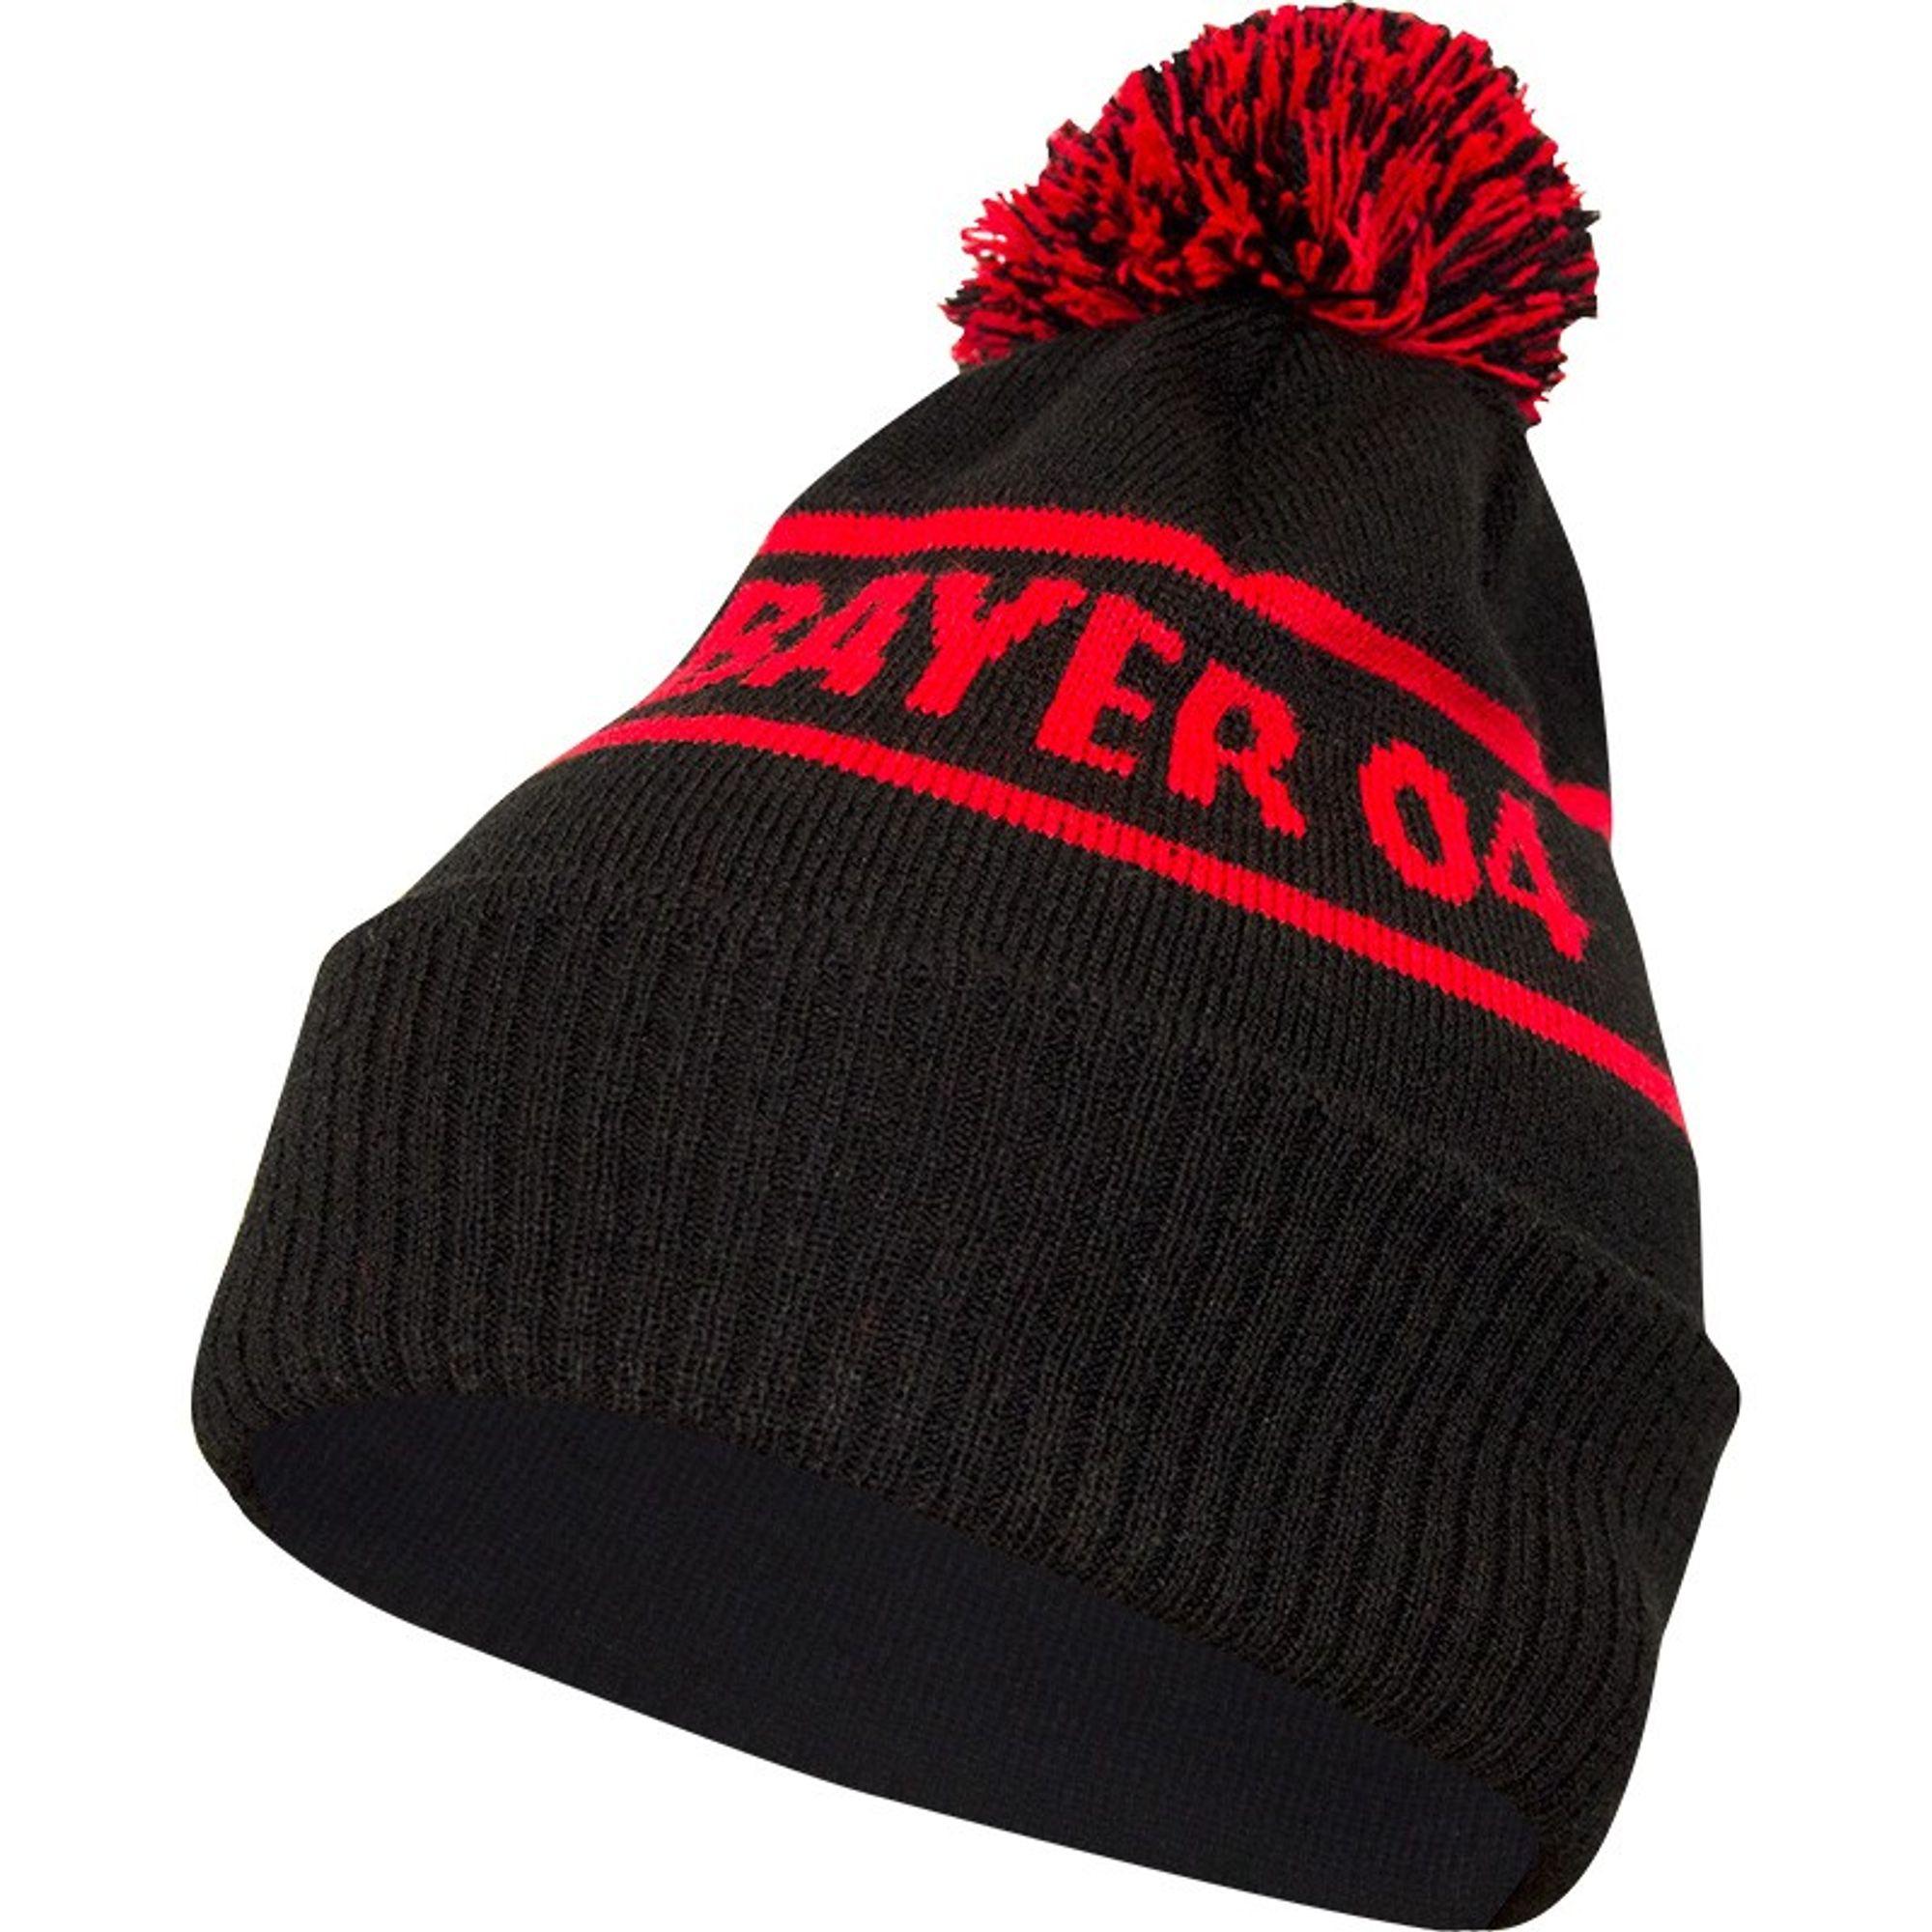 Jako Bayer 04 Leverkusen Bommelmütze - schwarz